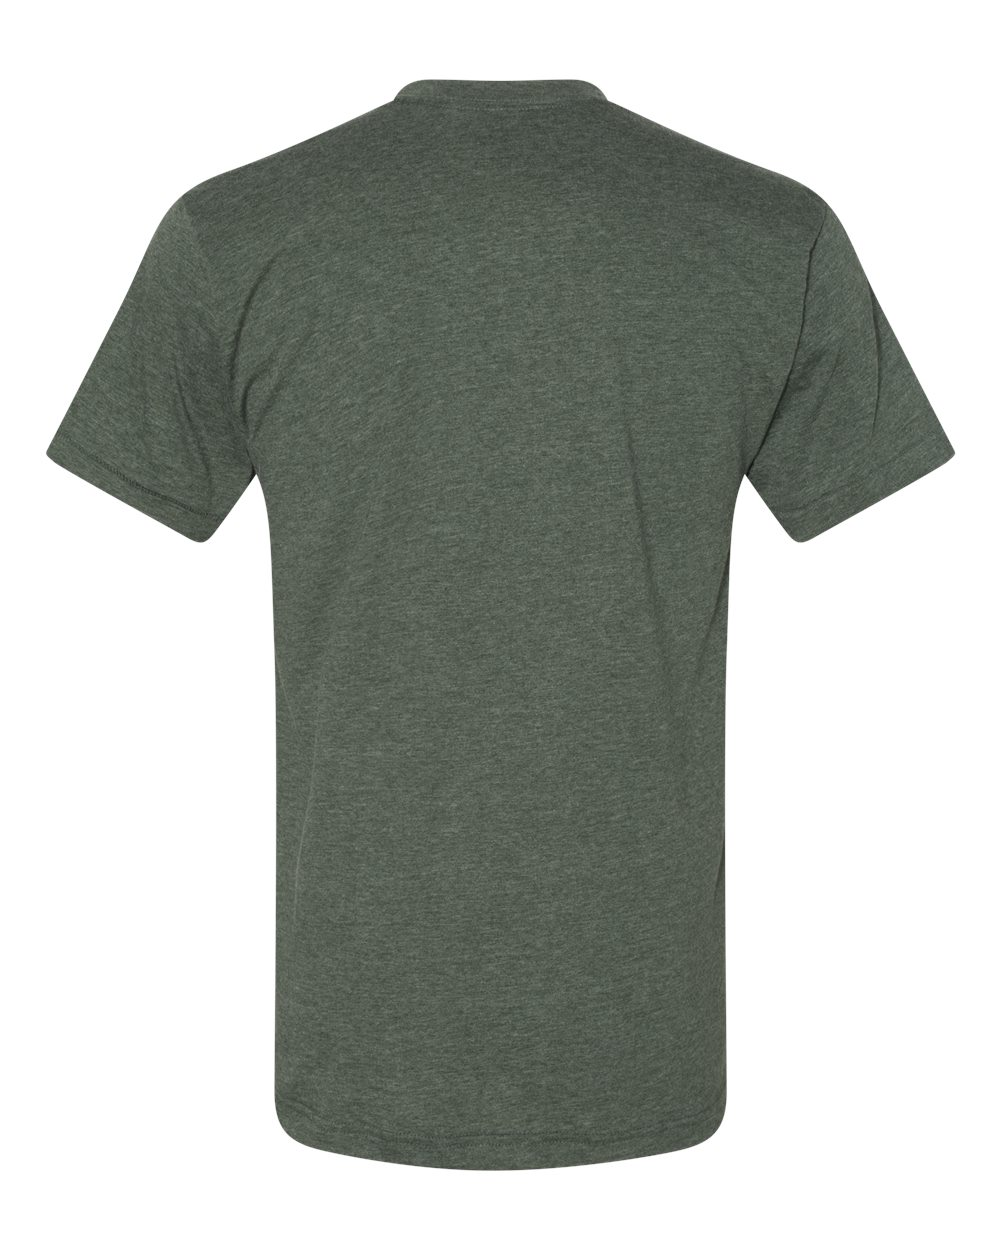 American-Apparel-Mens-Slim-Fit-50-50-Cotton-T-Shirt-Tee-BB401W-up-to-2XL thumbnail 19